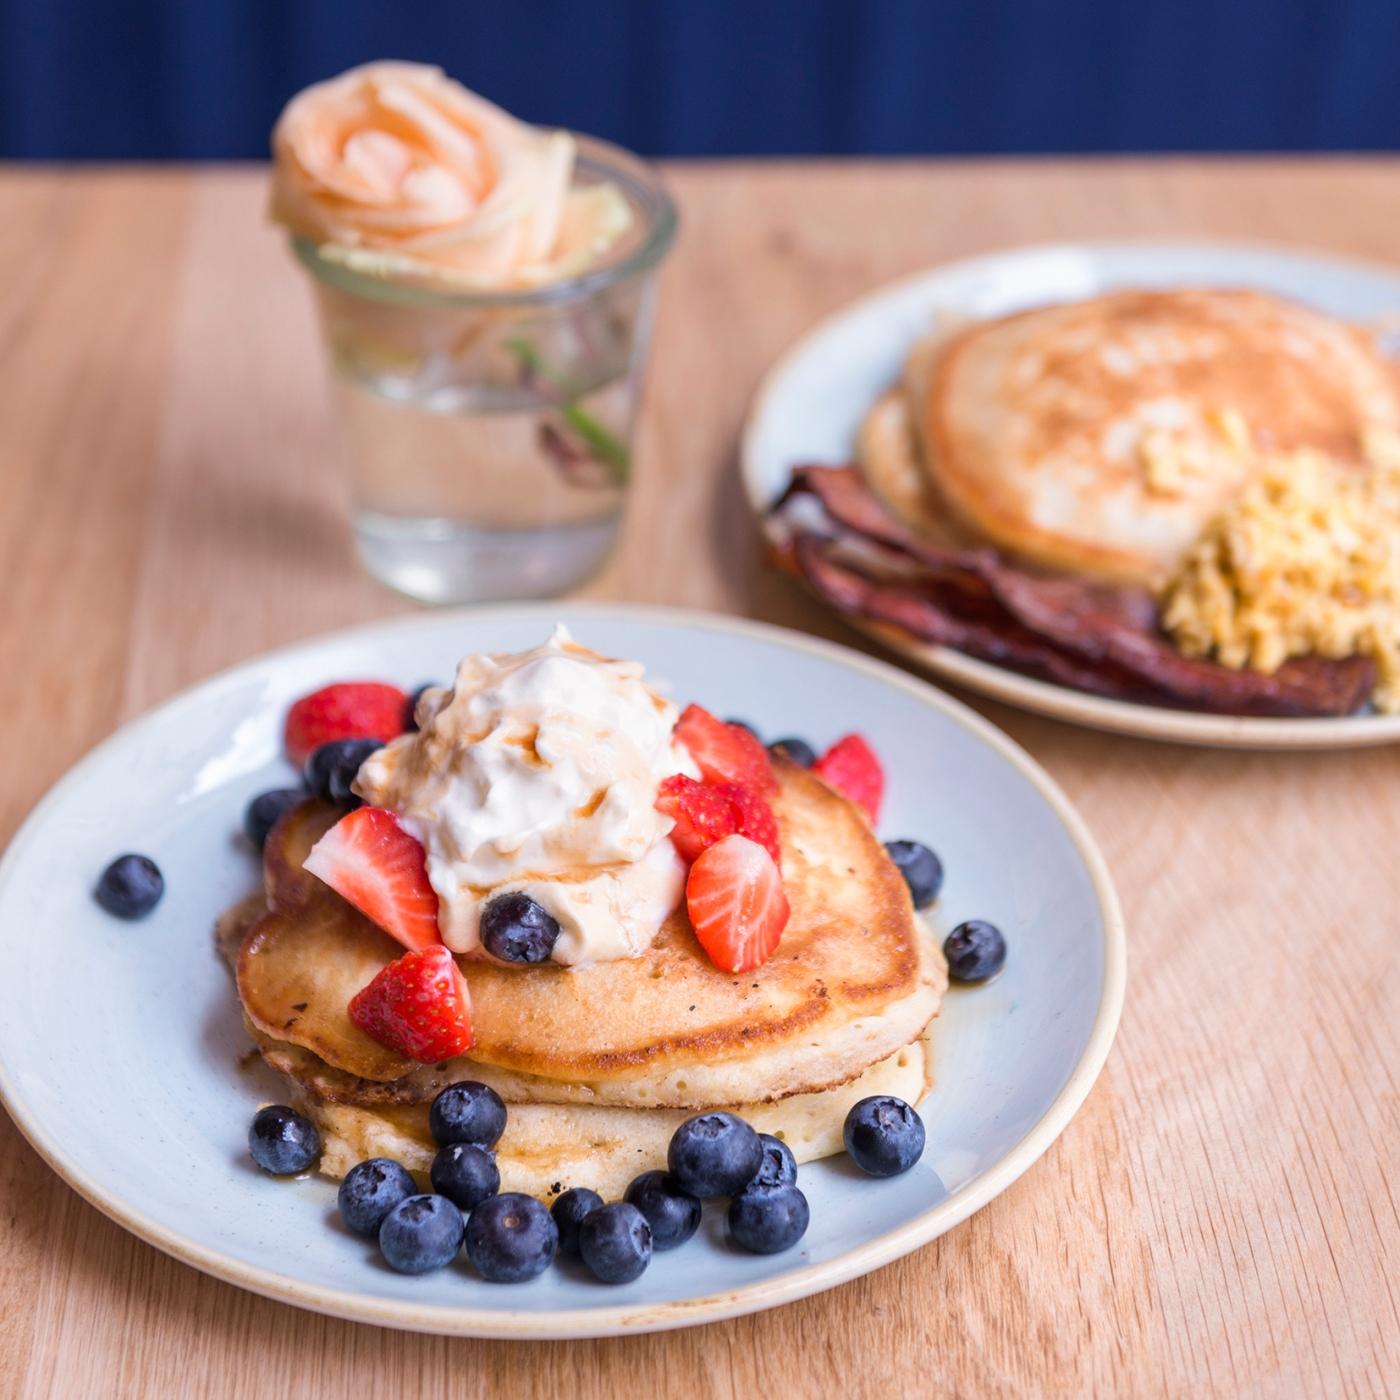 Les 2 options de pancakes chez Sunday in Soho